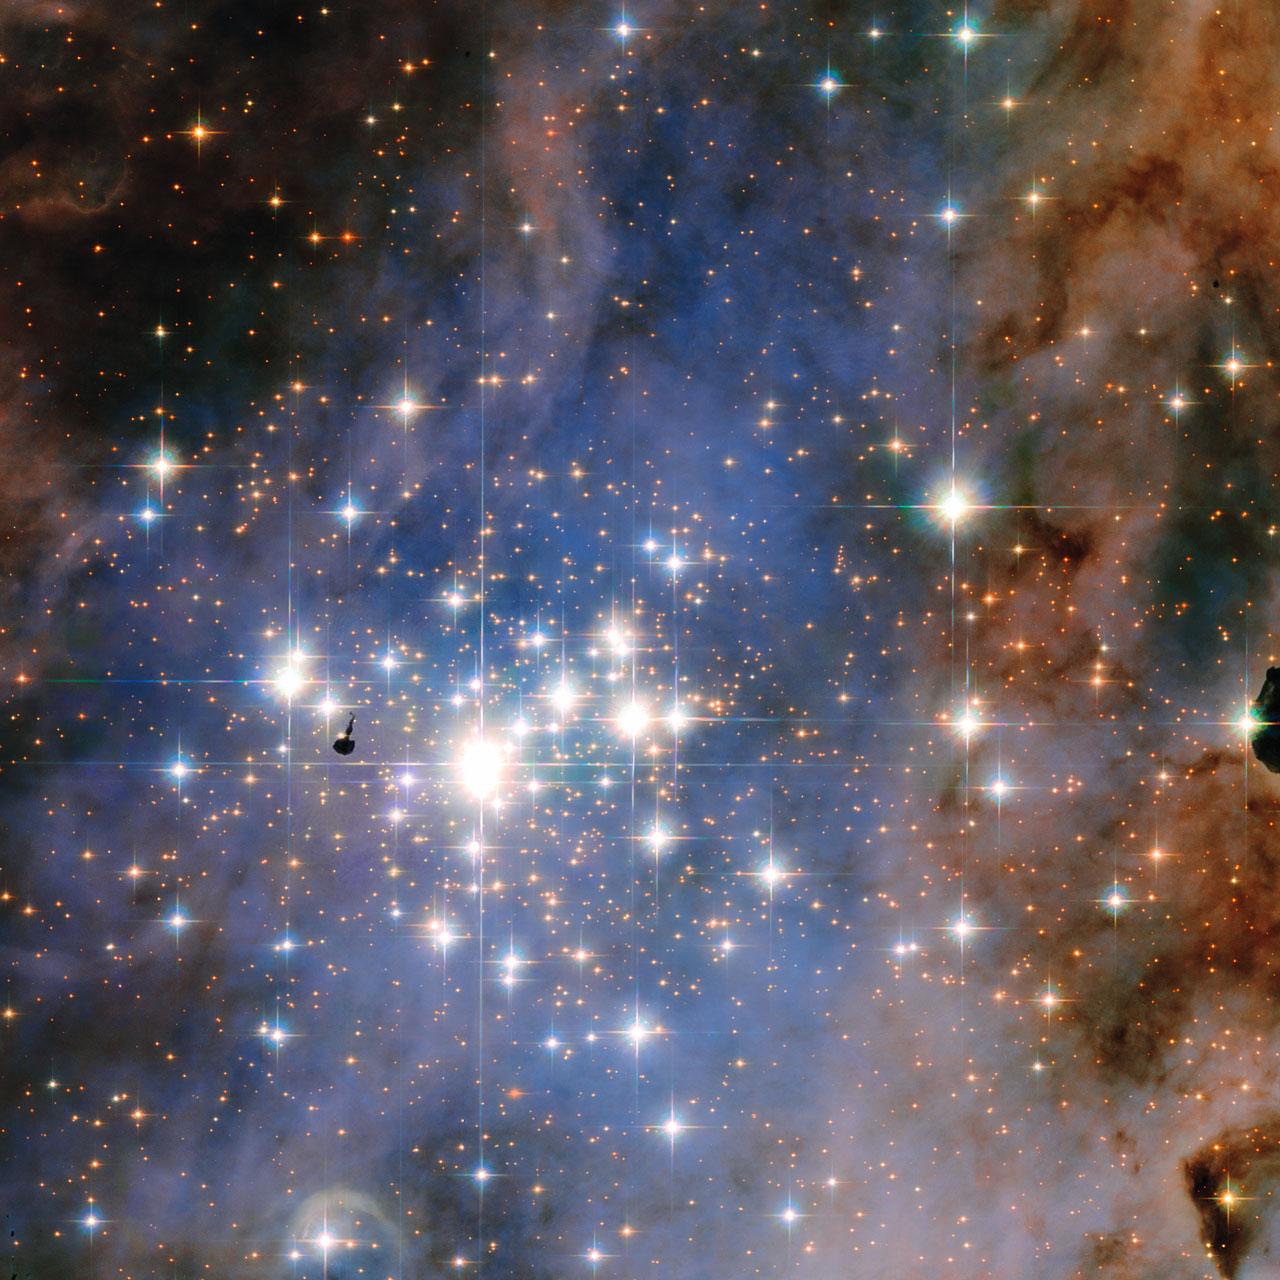 Image Credit:  NASA/ESA, jesús Maíz Apellániz